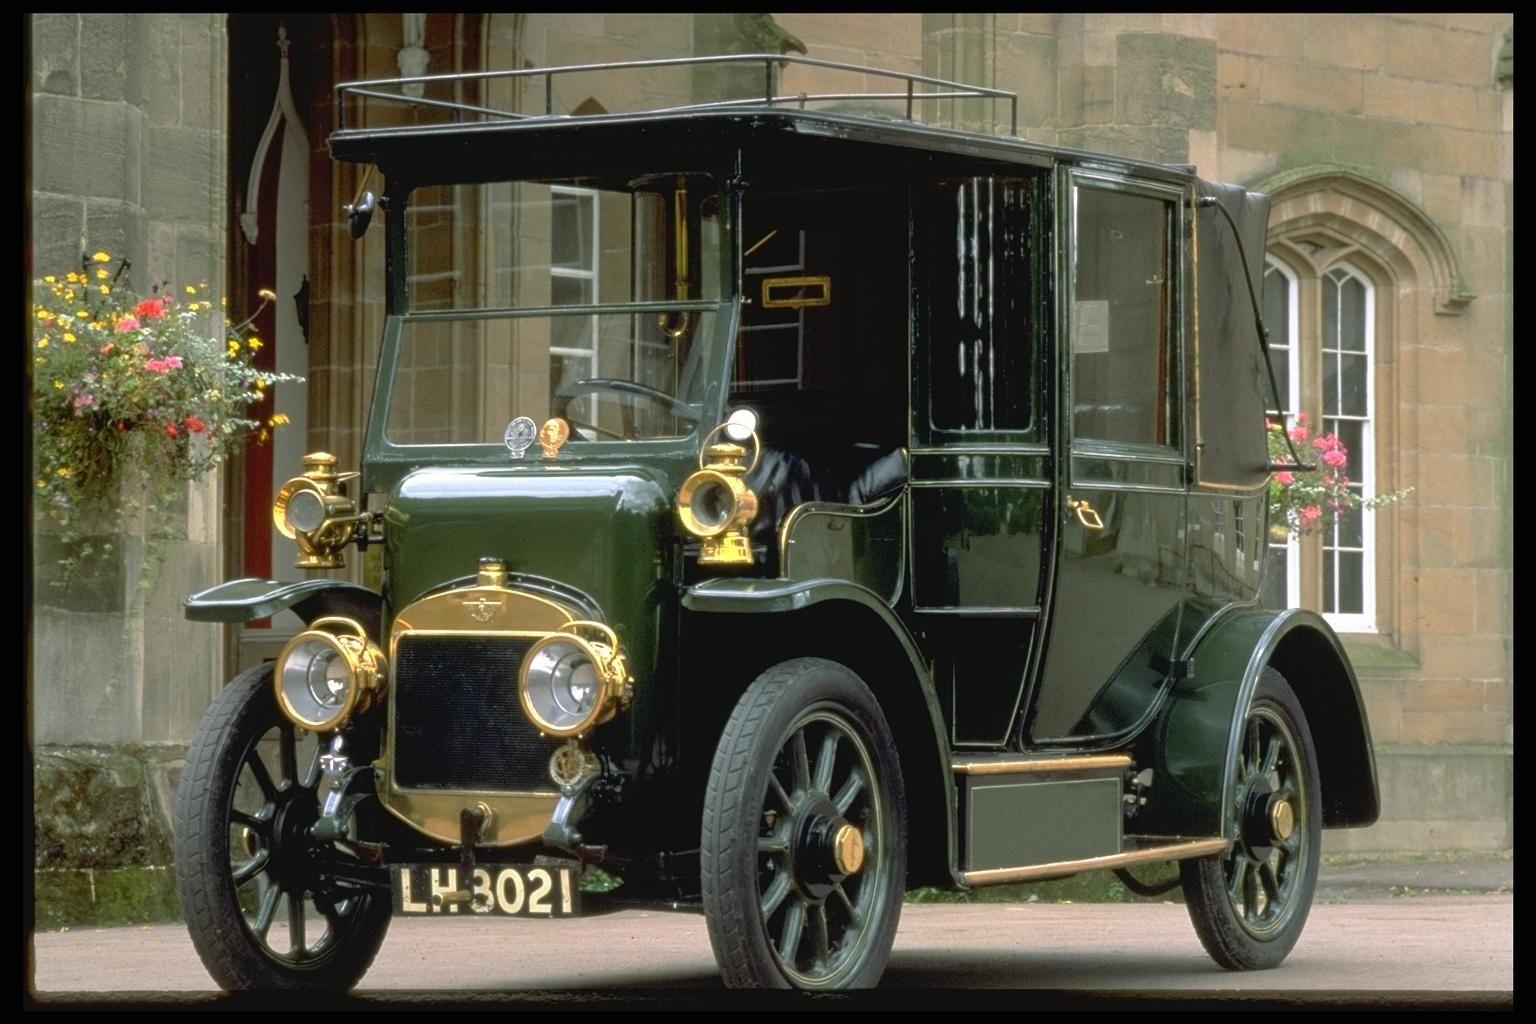 Austin 1911 15hp Town Carriage LH 3021 | Classic & Vintage Cars ...